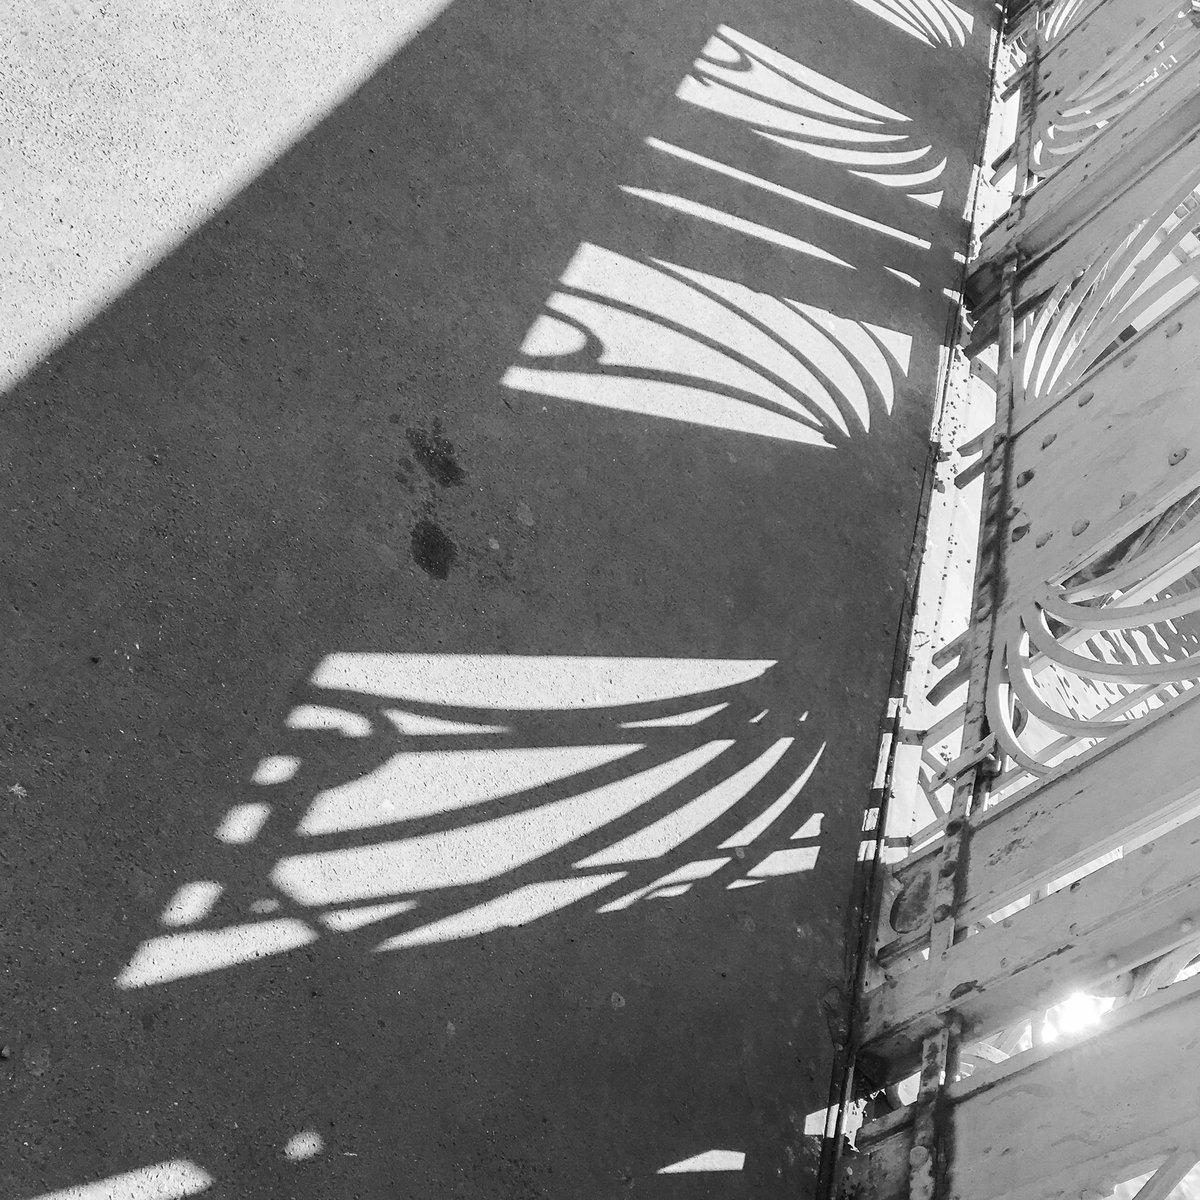 #shadow #reflection #prague #praha #czechrepublic @PragueEU @VisitCZ